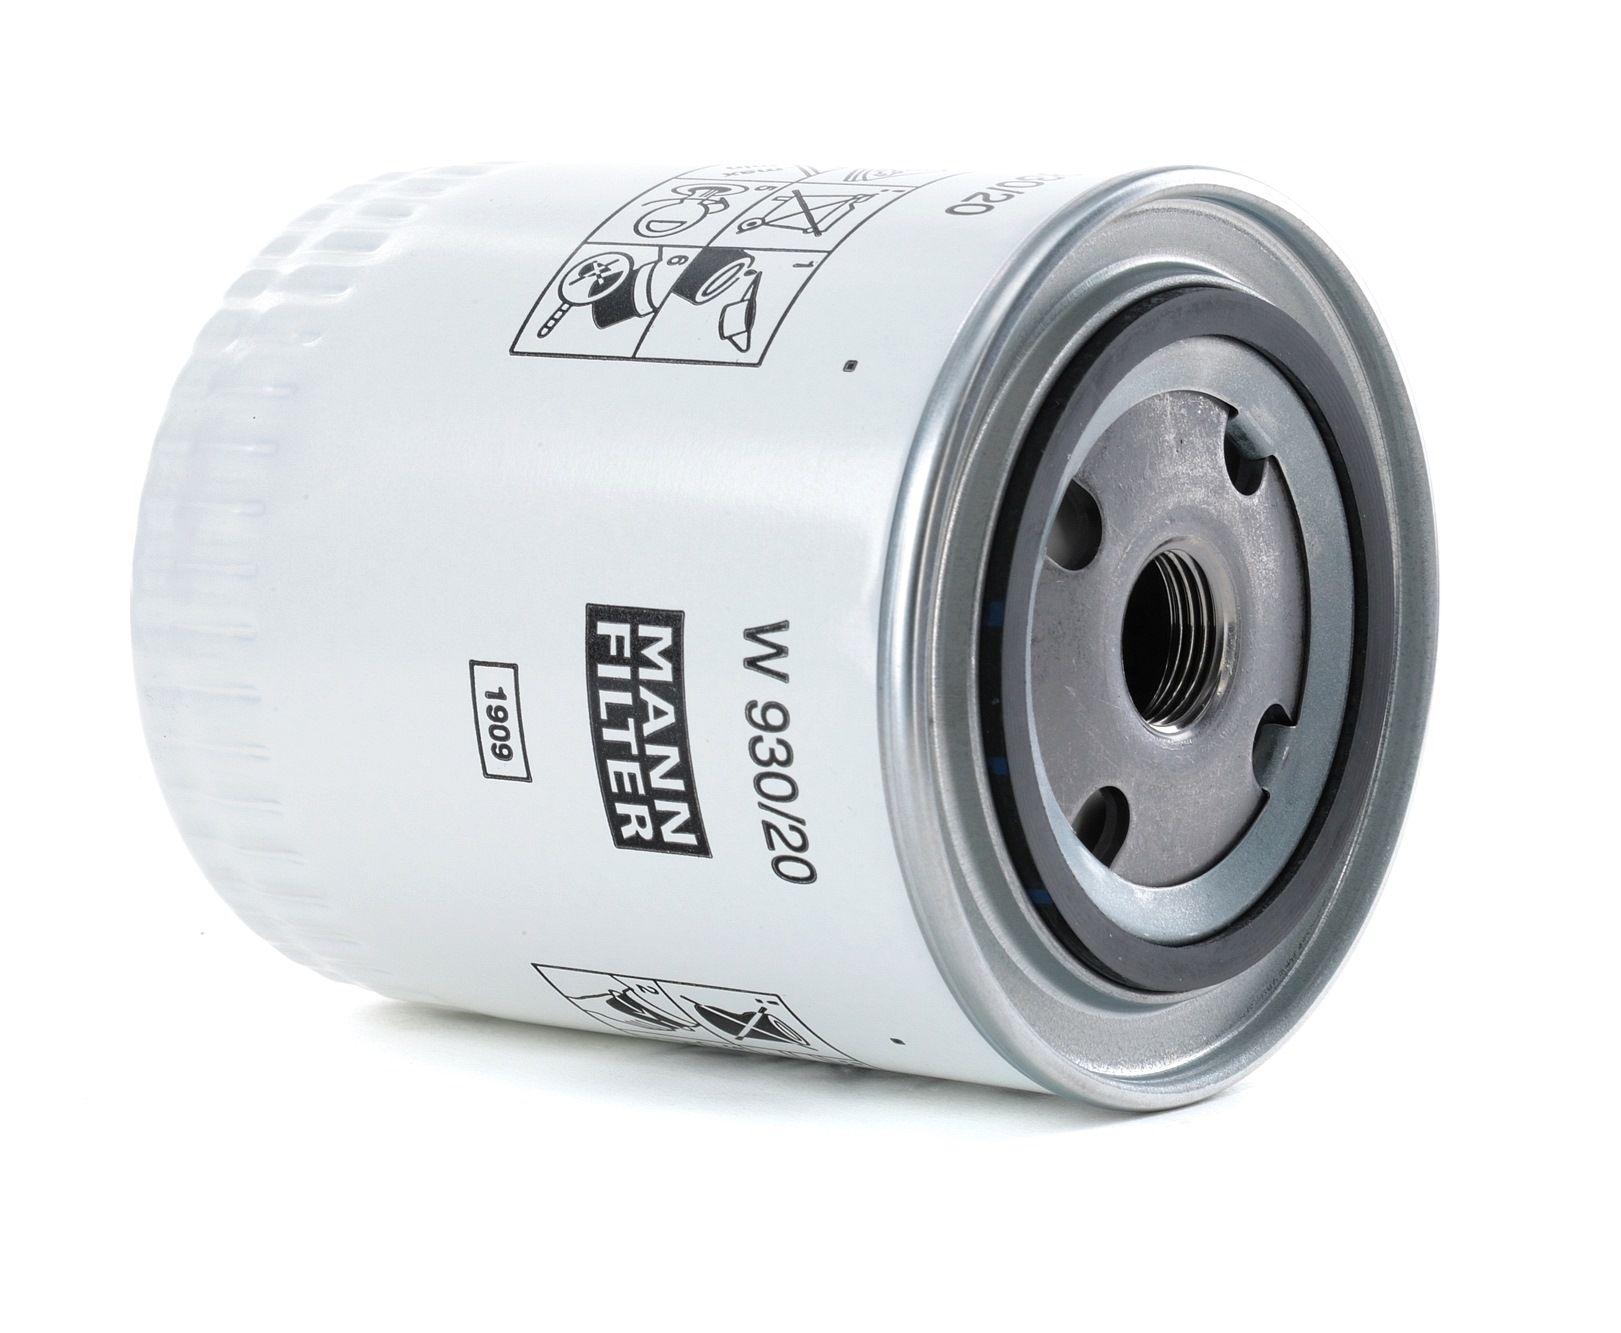 MANN-FILTER: Original Ölfilter W 930/20 (Innendurchmesser 2: 62mm, Innendurchmesser 2: 62mm, Ø: 93mm, Außendurchmesser 2: 71mm, Höhe: 114mm)